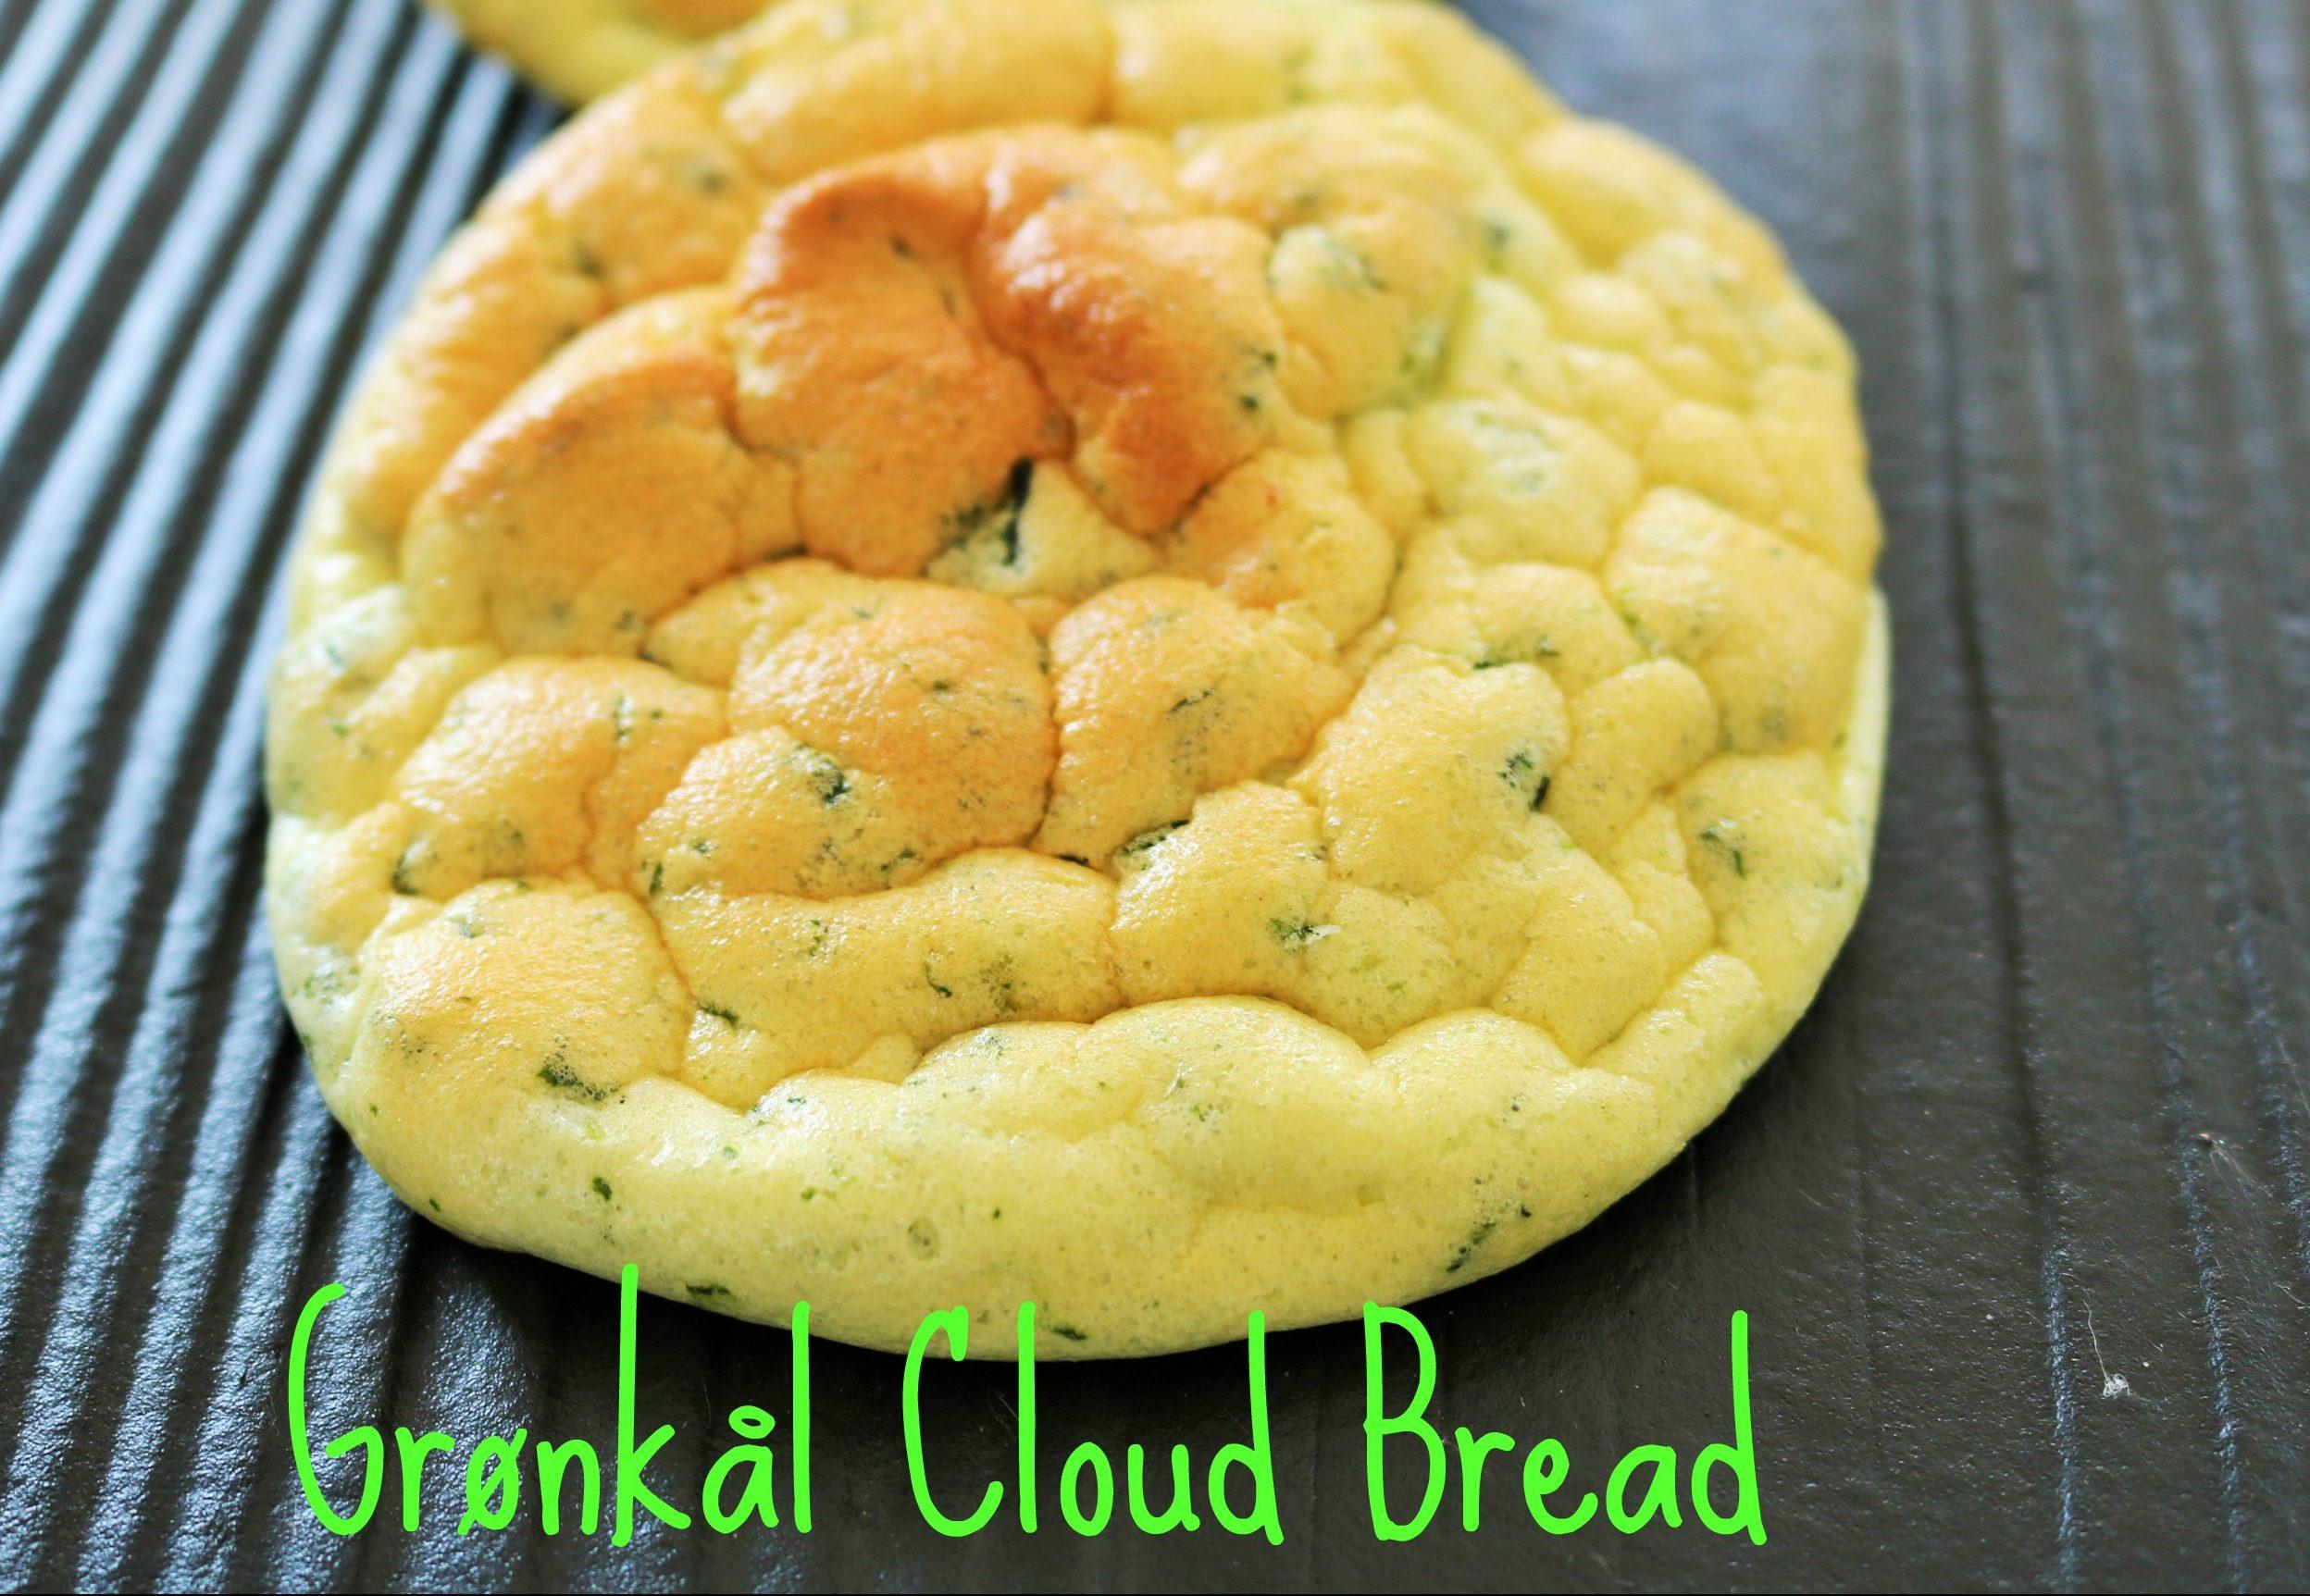 Grønkål Cloud Bread